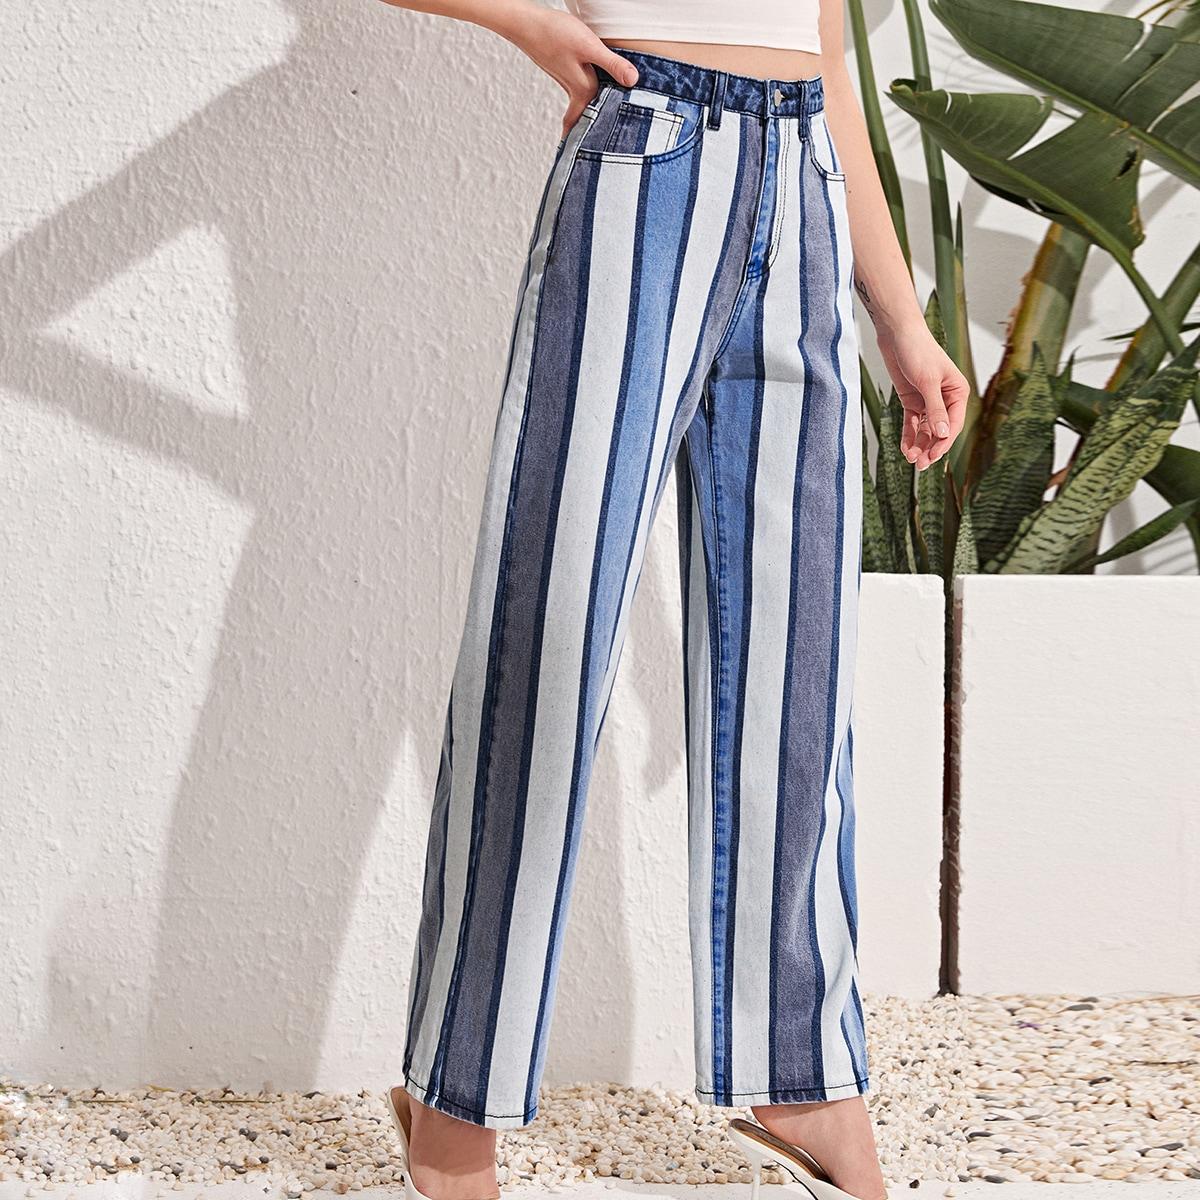 High Waist Slant Pocket Striped Jeans, SHEIN  - buy with discount